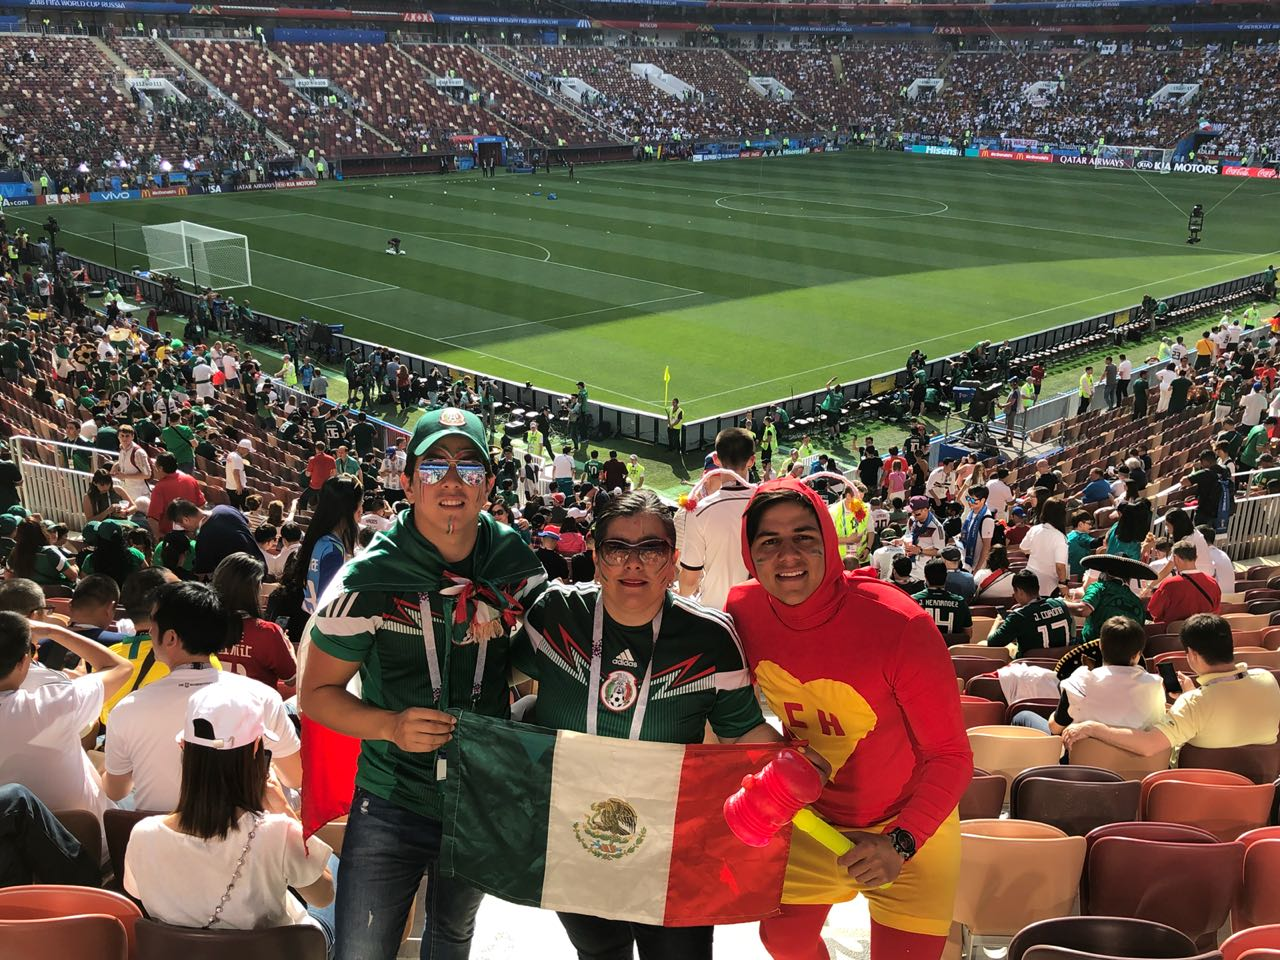 Maru Moreno (center) celebrates Mexico's 1-0 victory over Germany at 2018 World Cup Photo Latin Life Denver Media